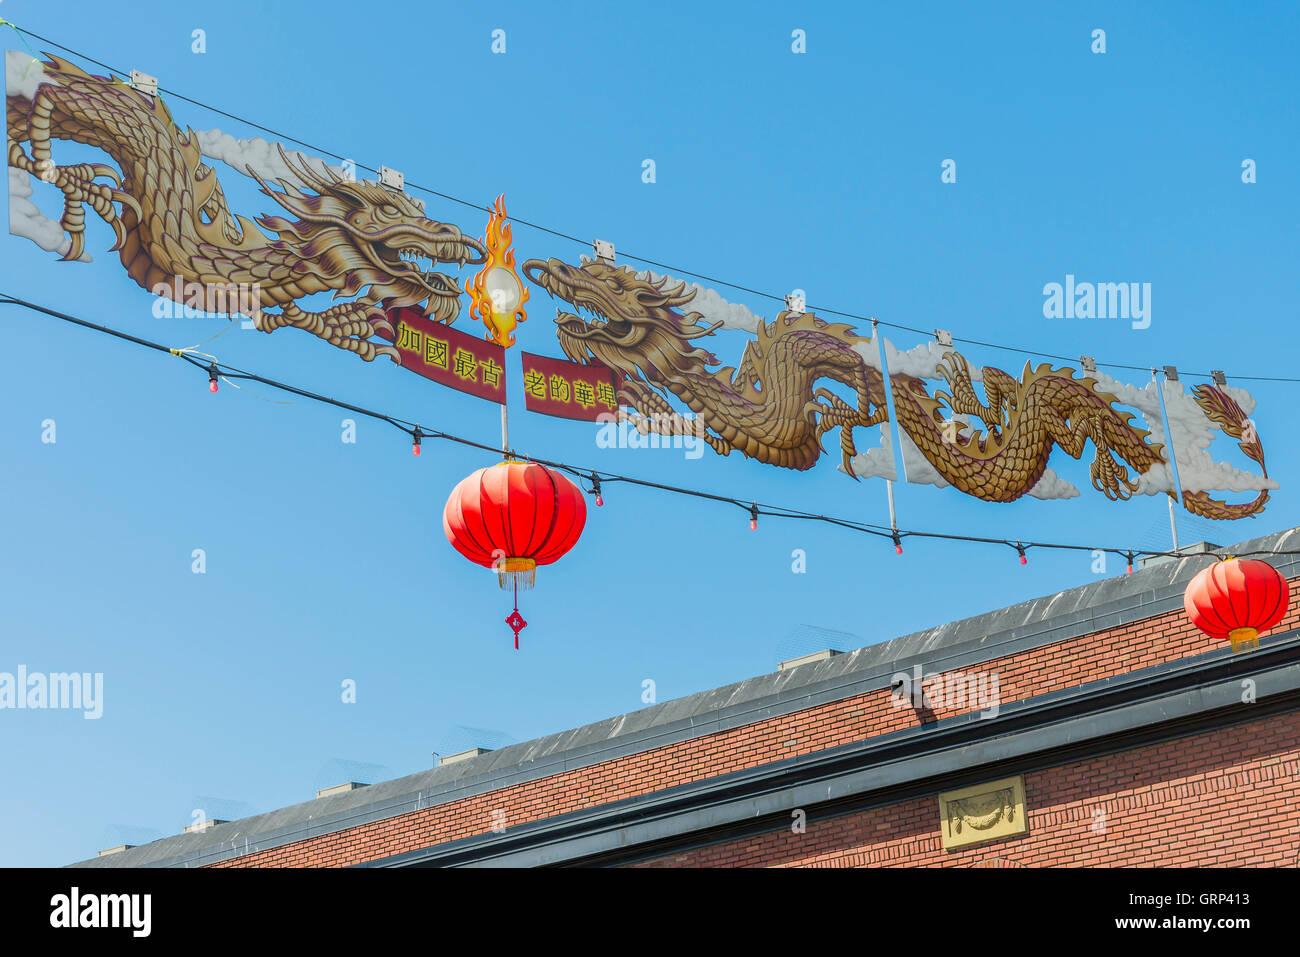 Dragon street banner, Chinatown, Victoria, British Columbia, Canadá Imagen De Stock